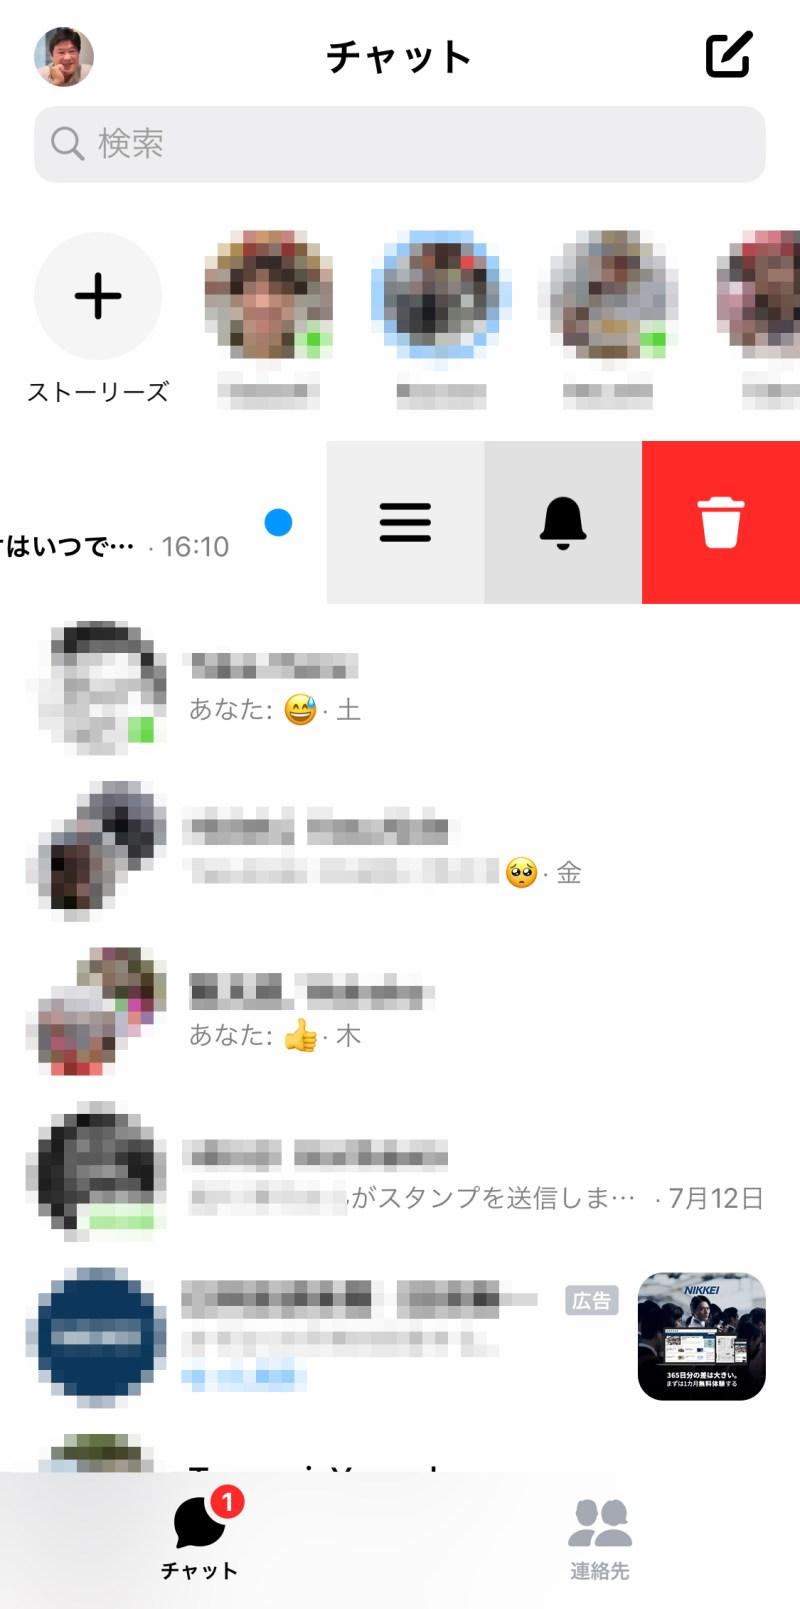 Facebook messenger のSPAMメッセージの削除方法